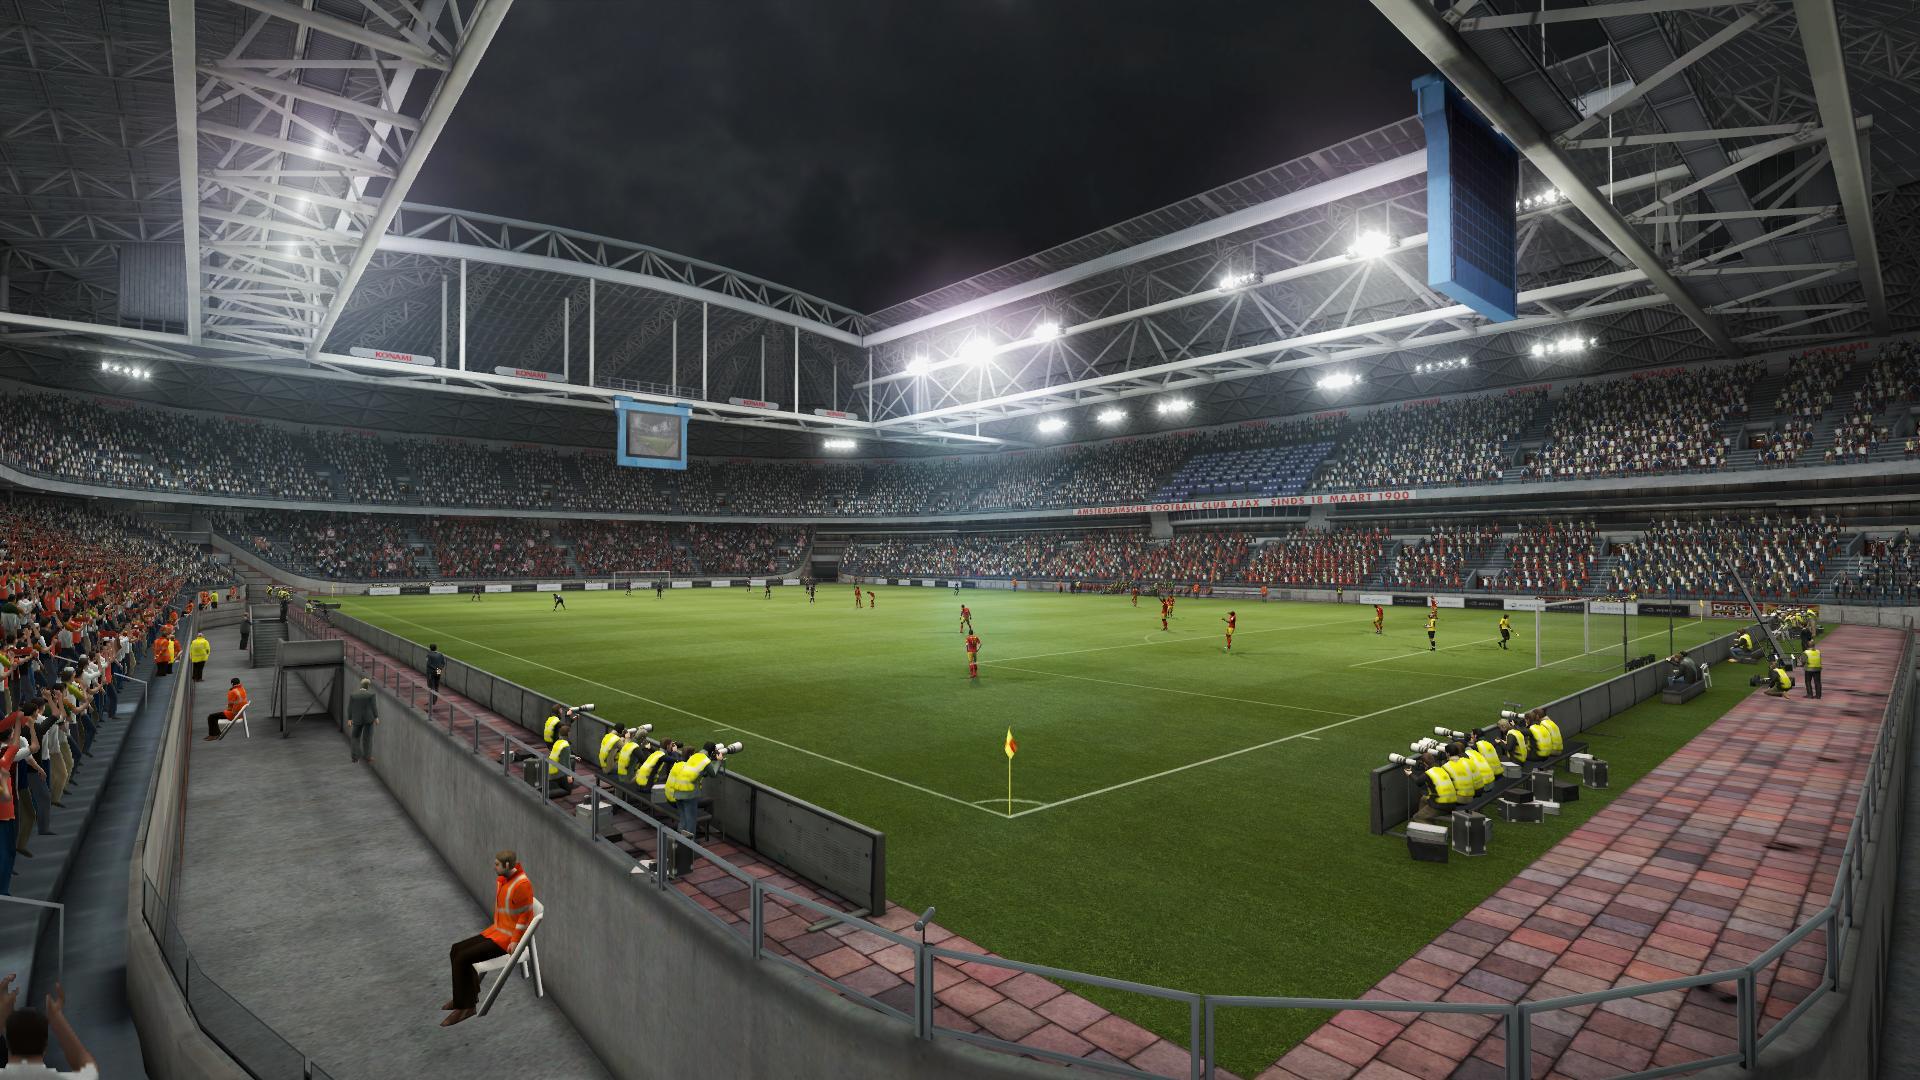 amsterdam arena (27)